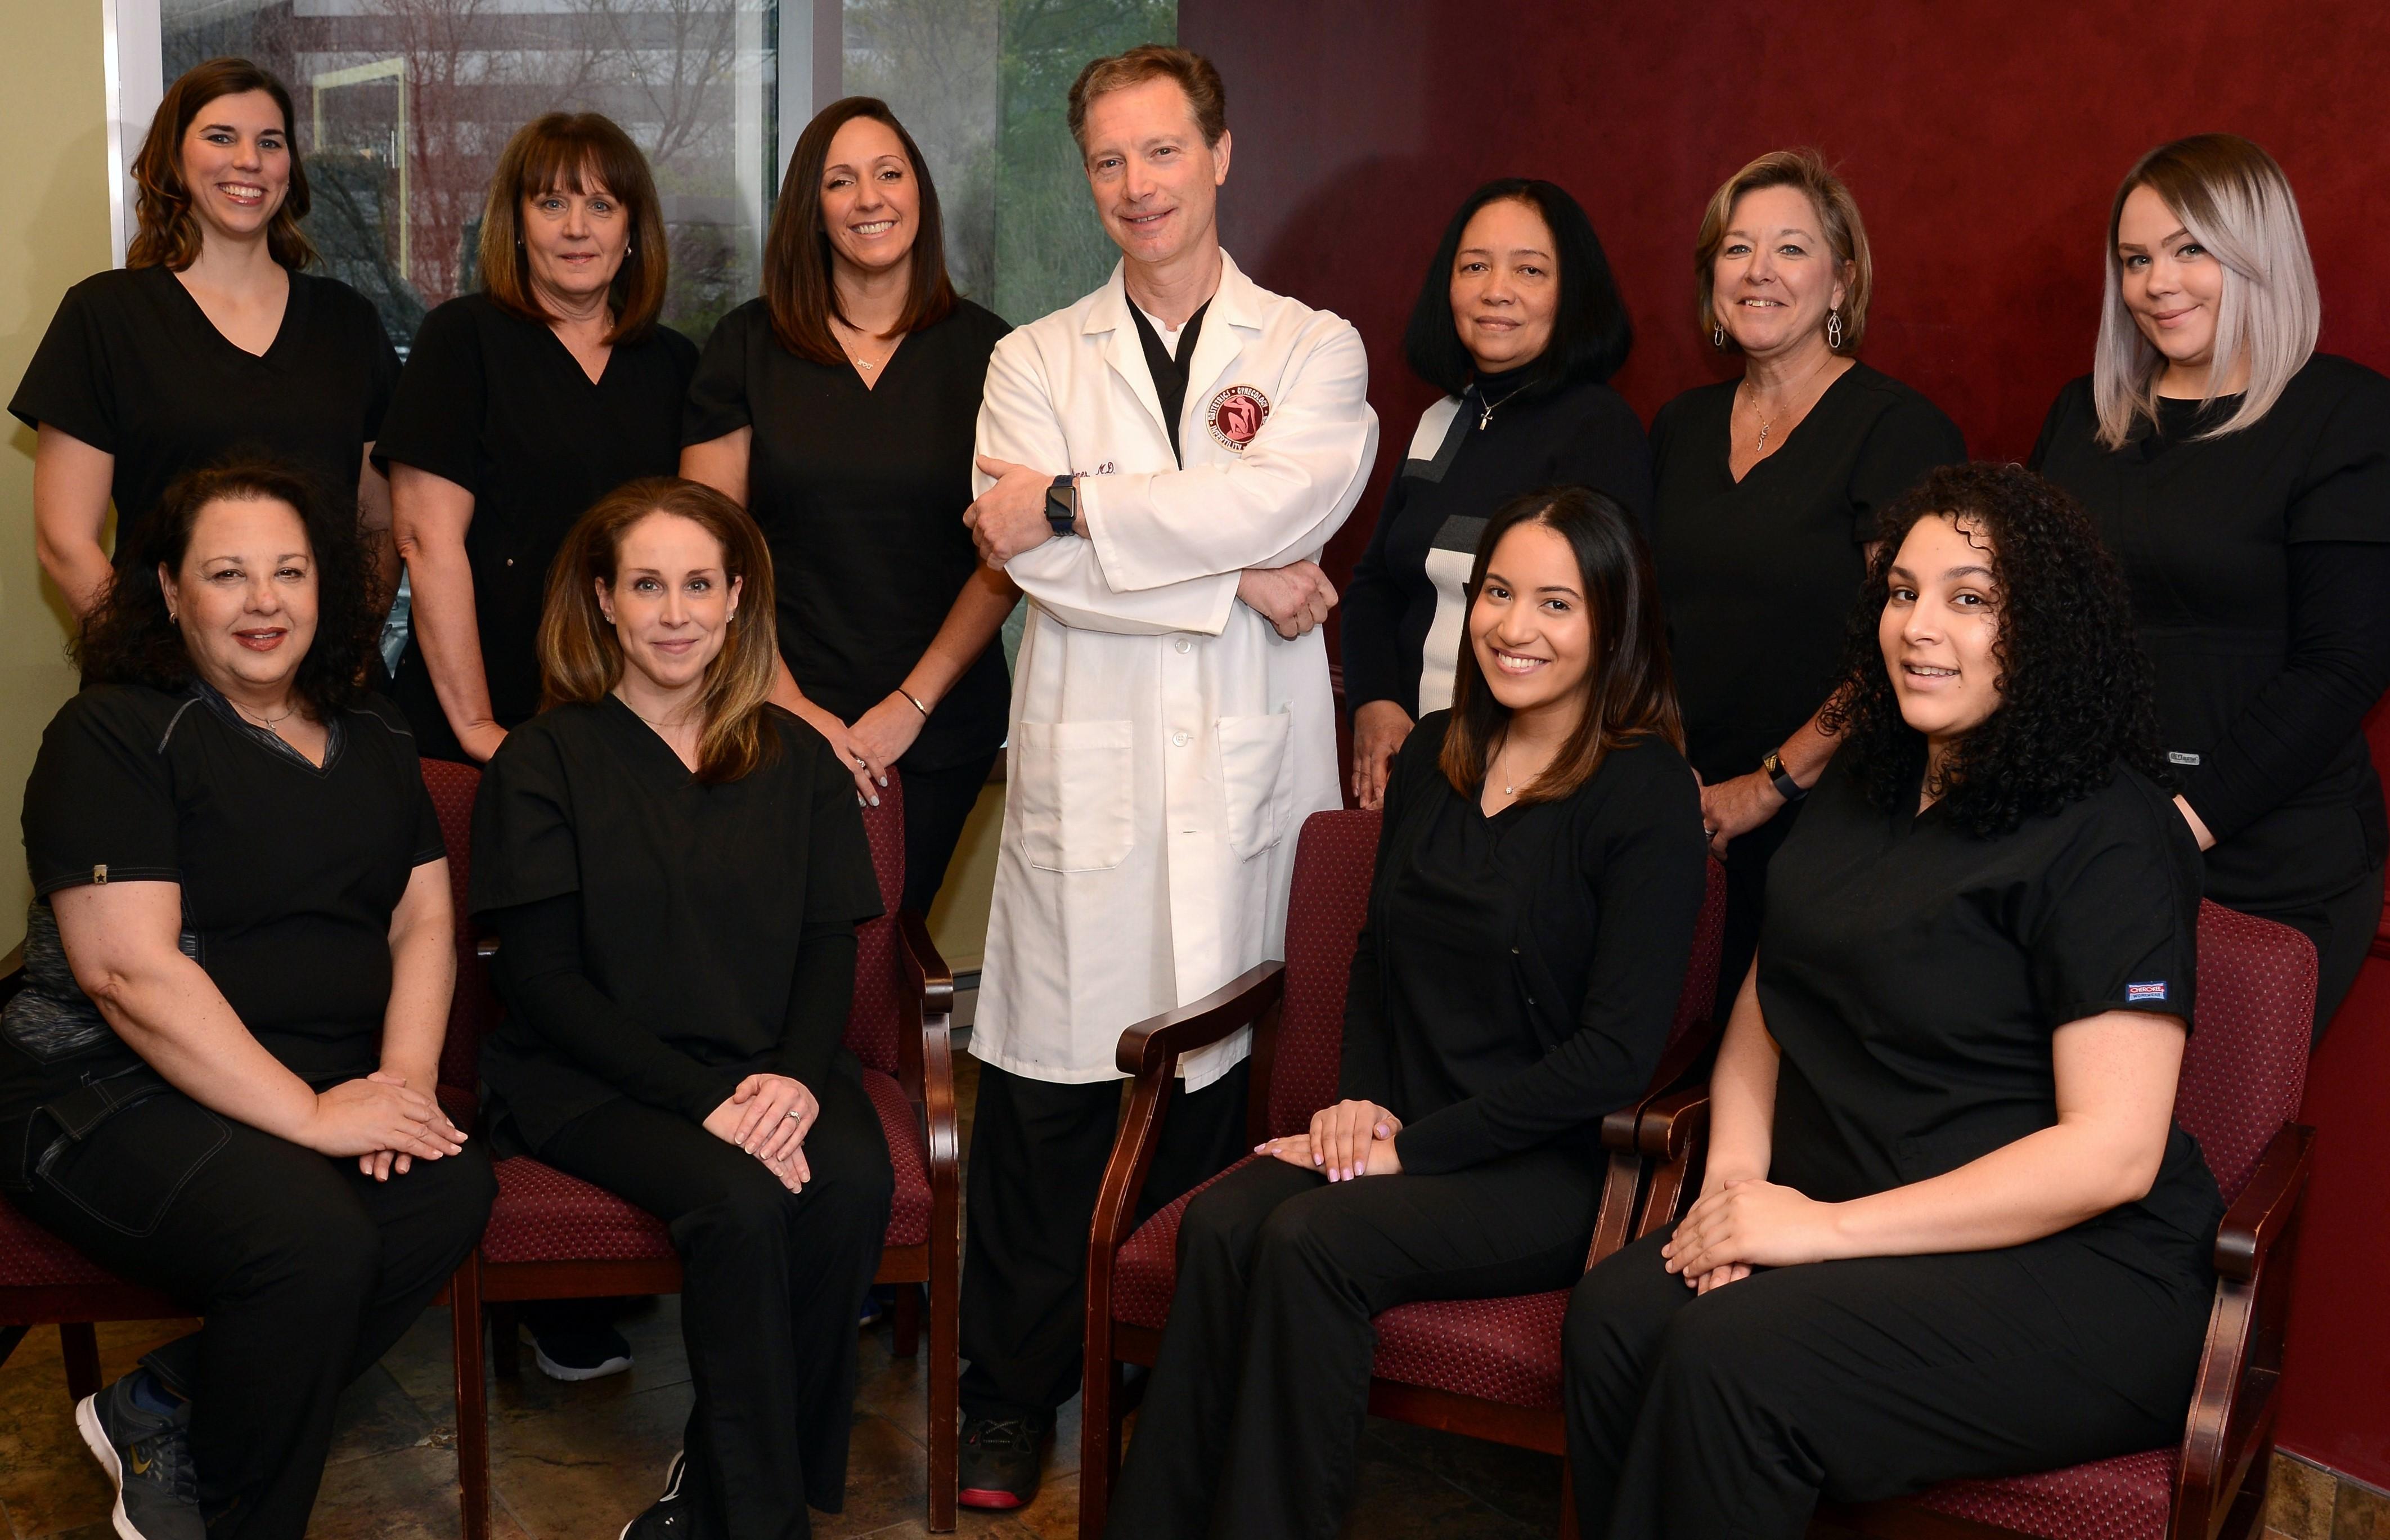 About Us | Comprehensive Women's Care Of Paramus - Dr  Craig